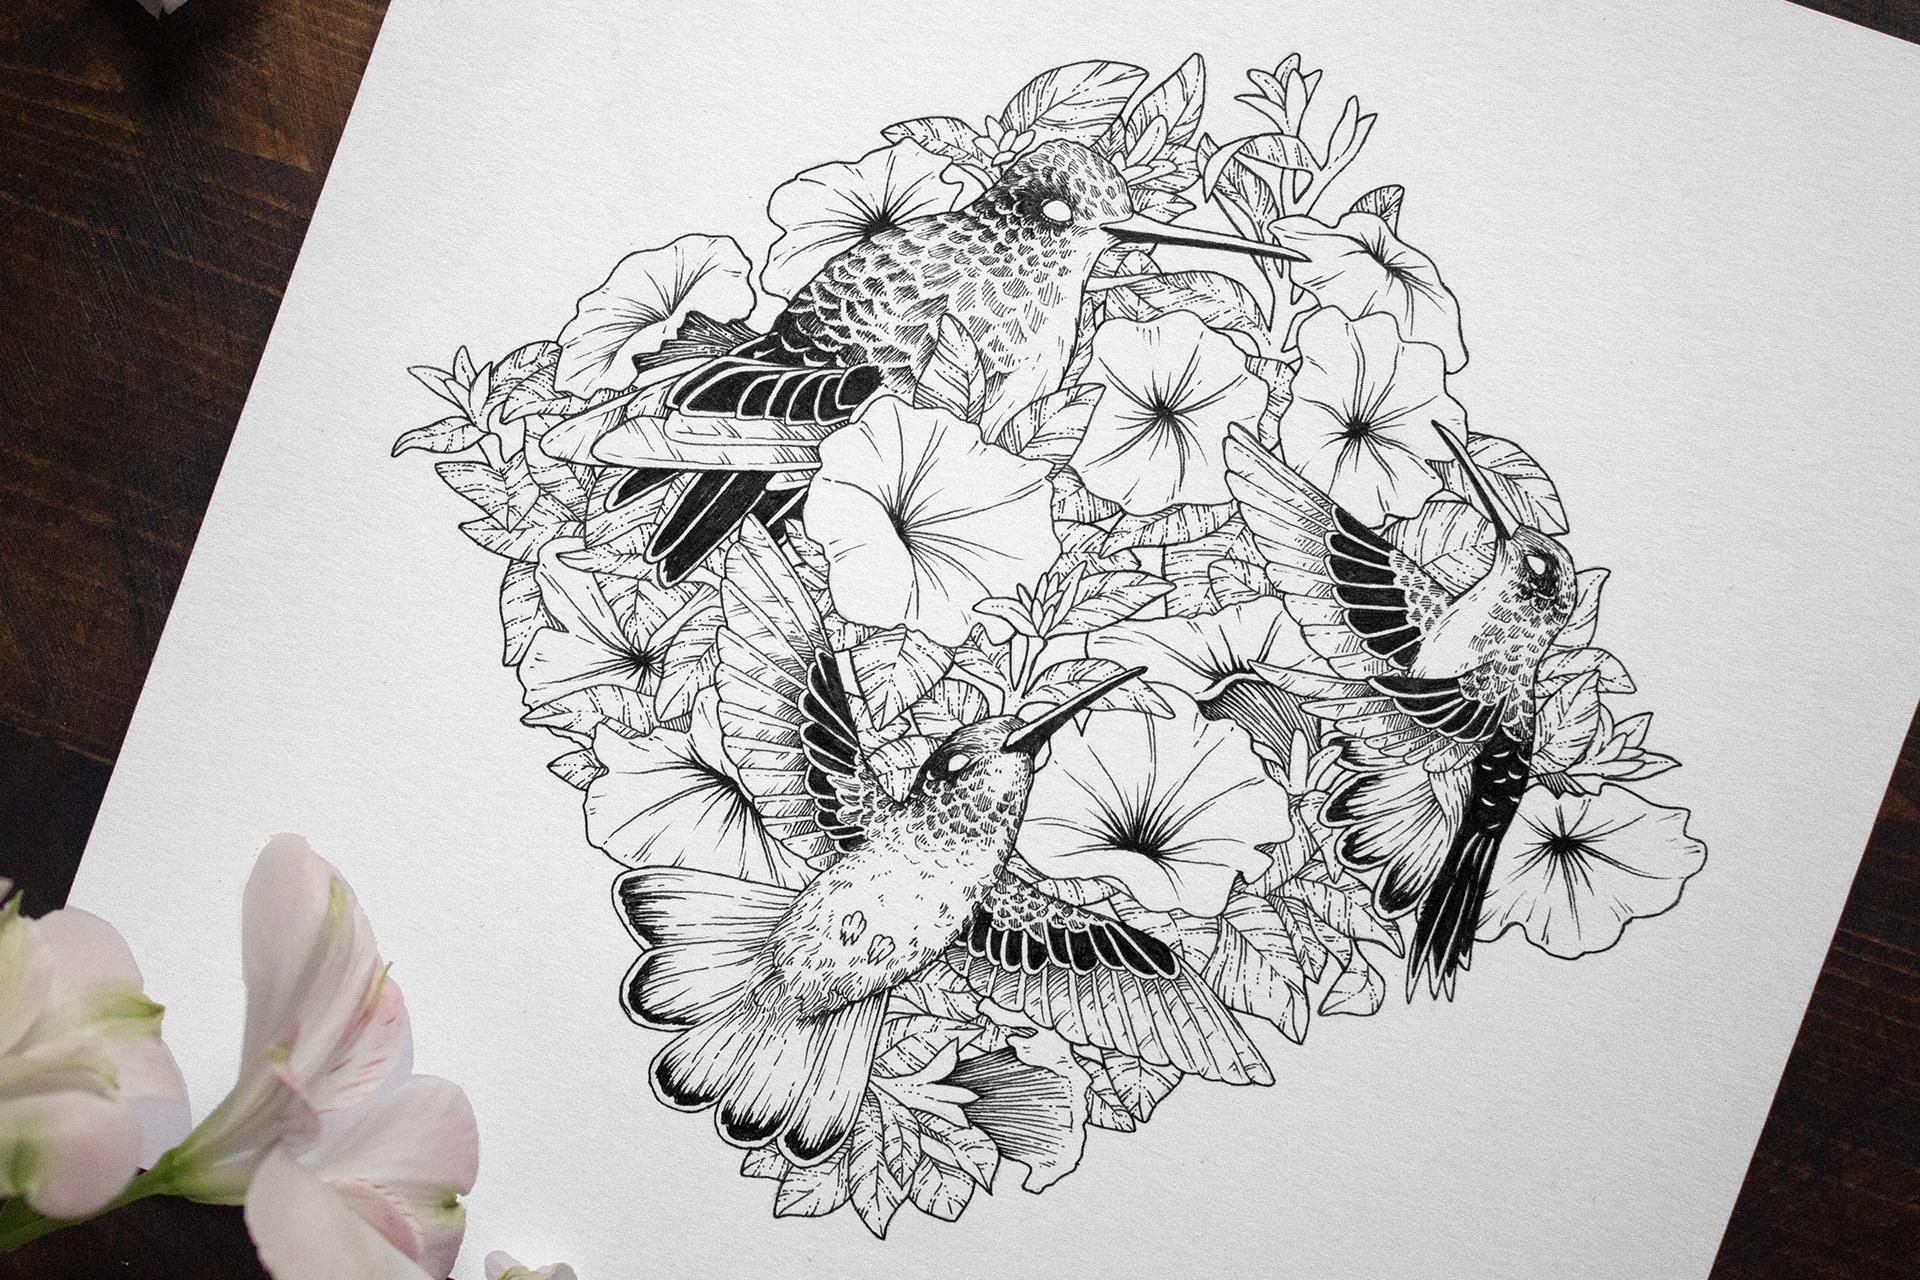 Jenn Sneary Illustration, Flitter, Pen and Ink drawings